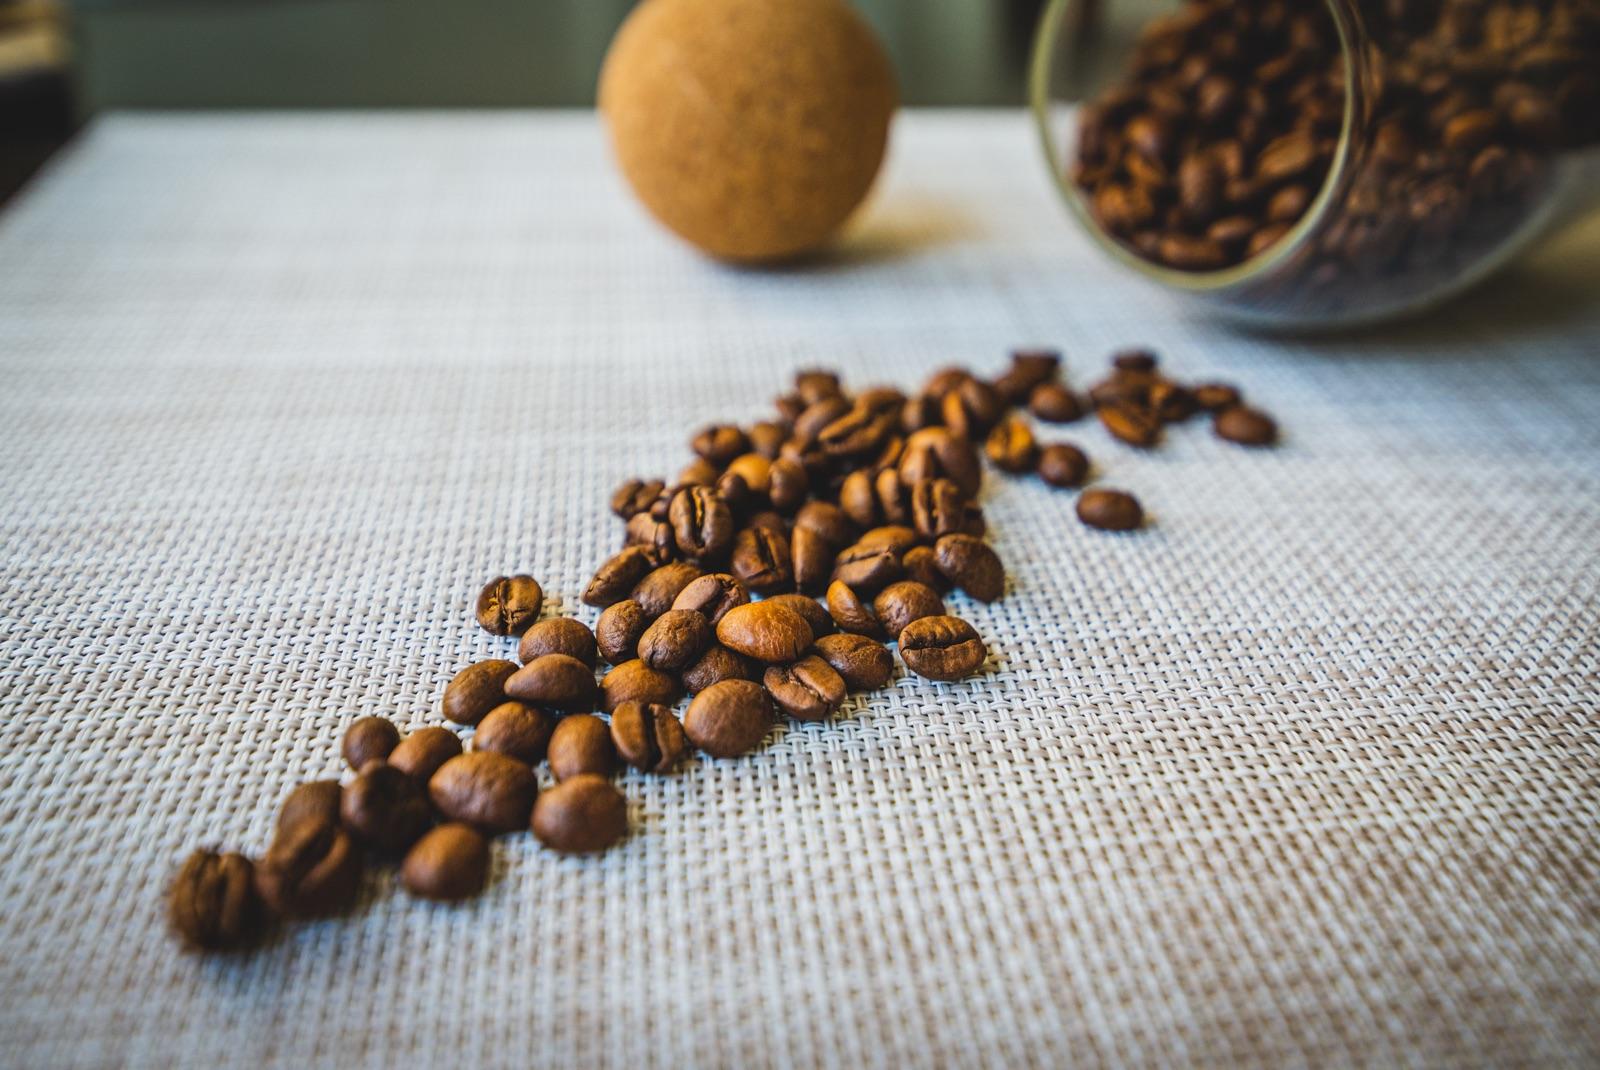 El café, la materia prima